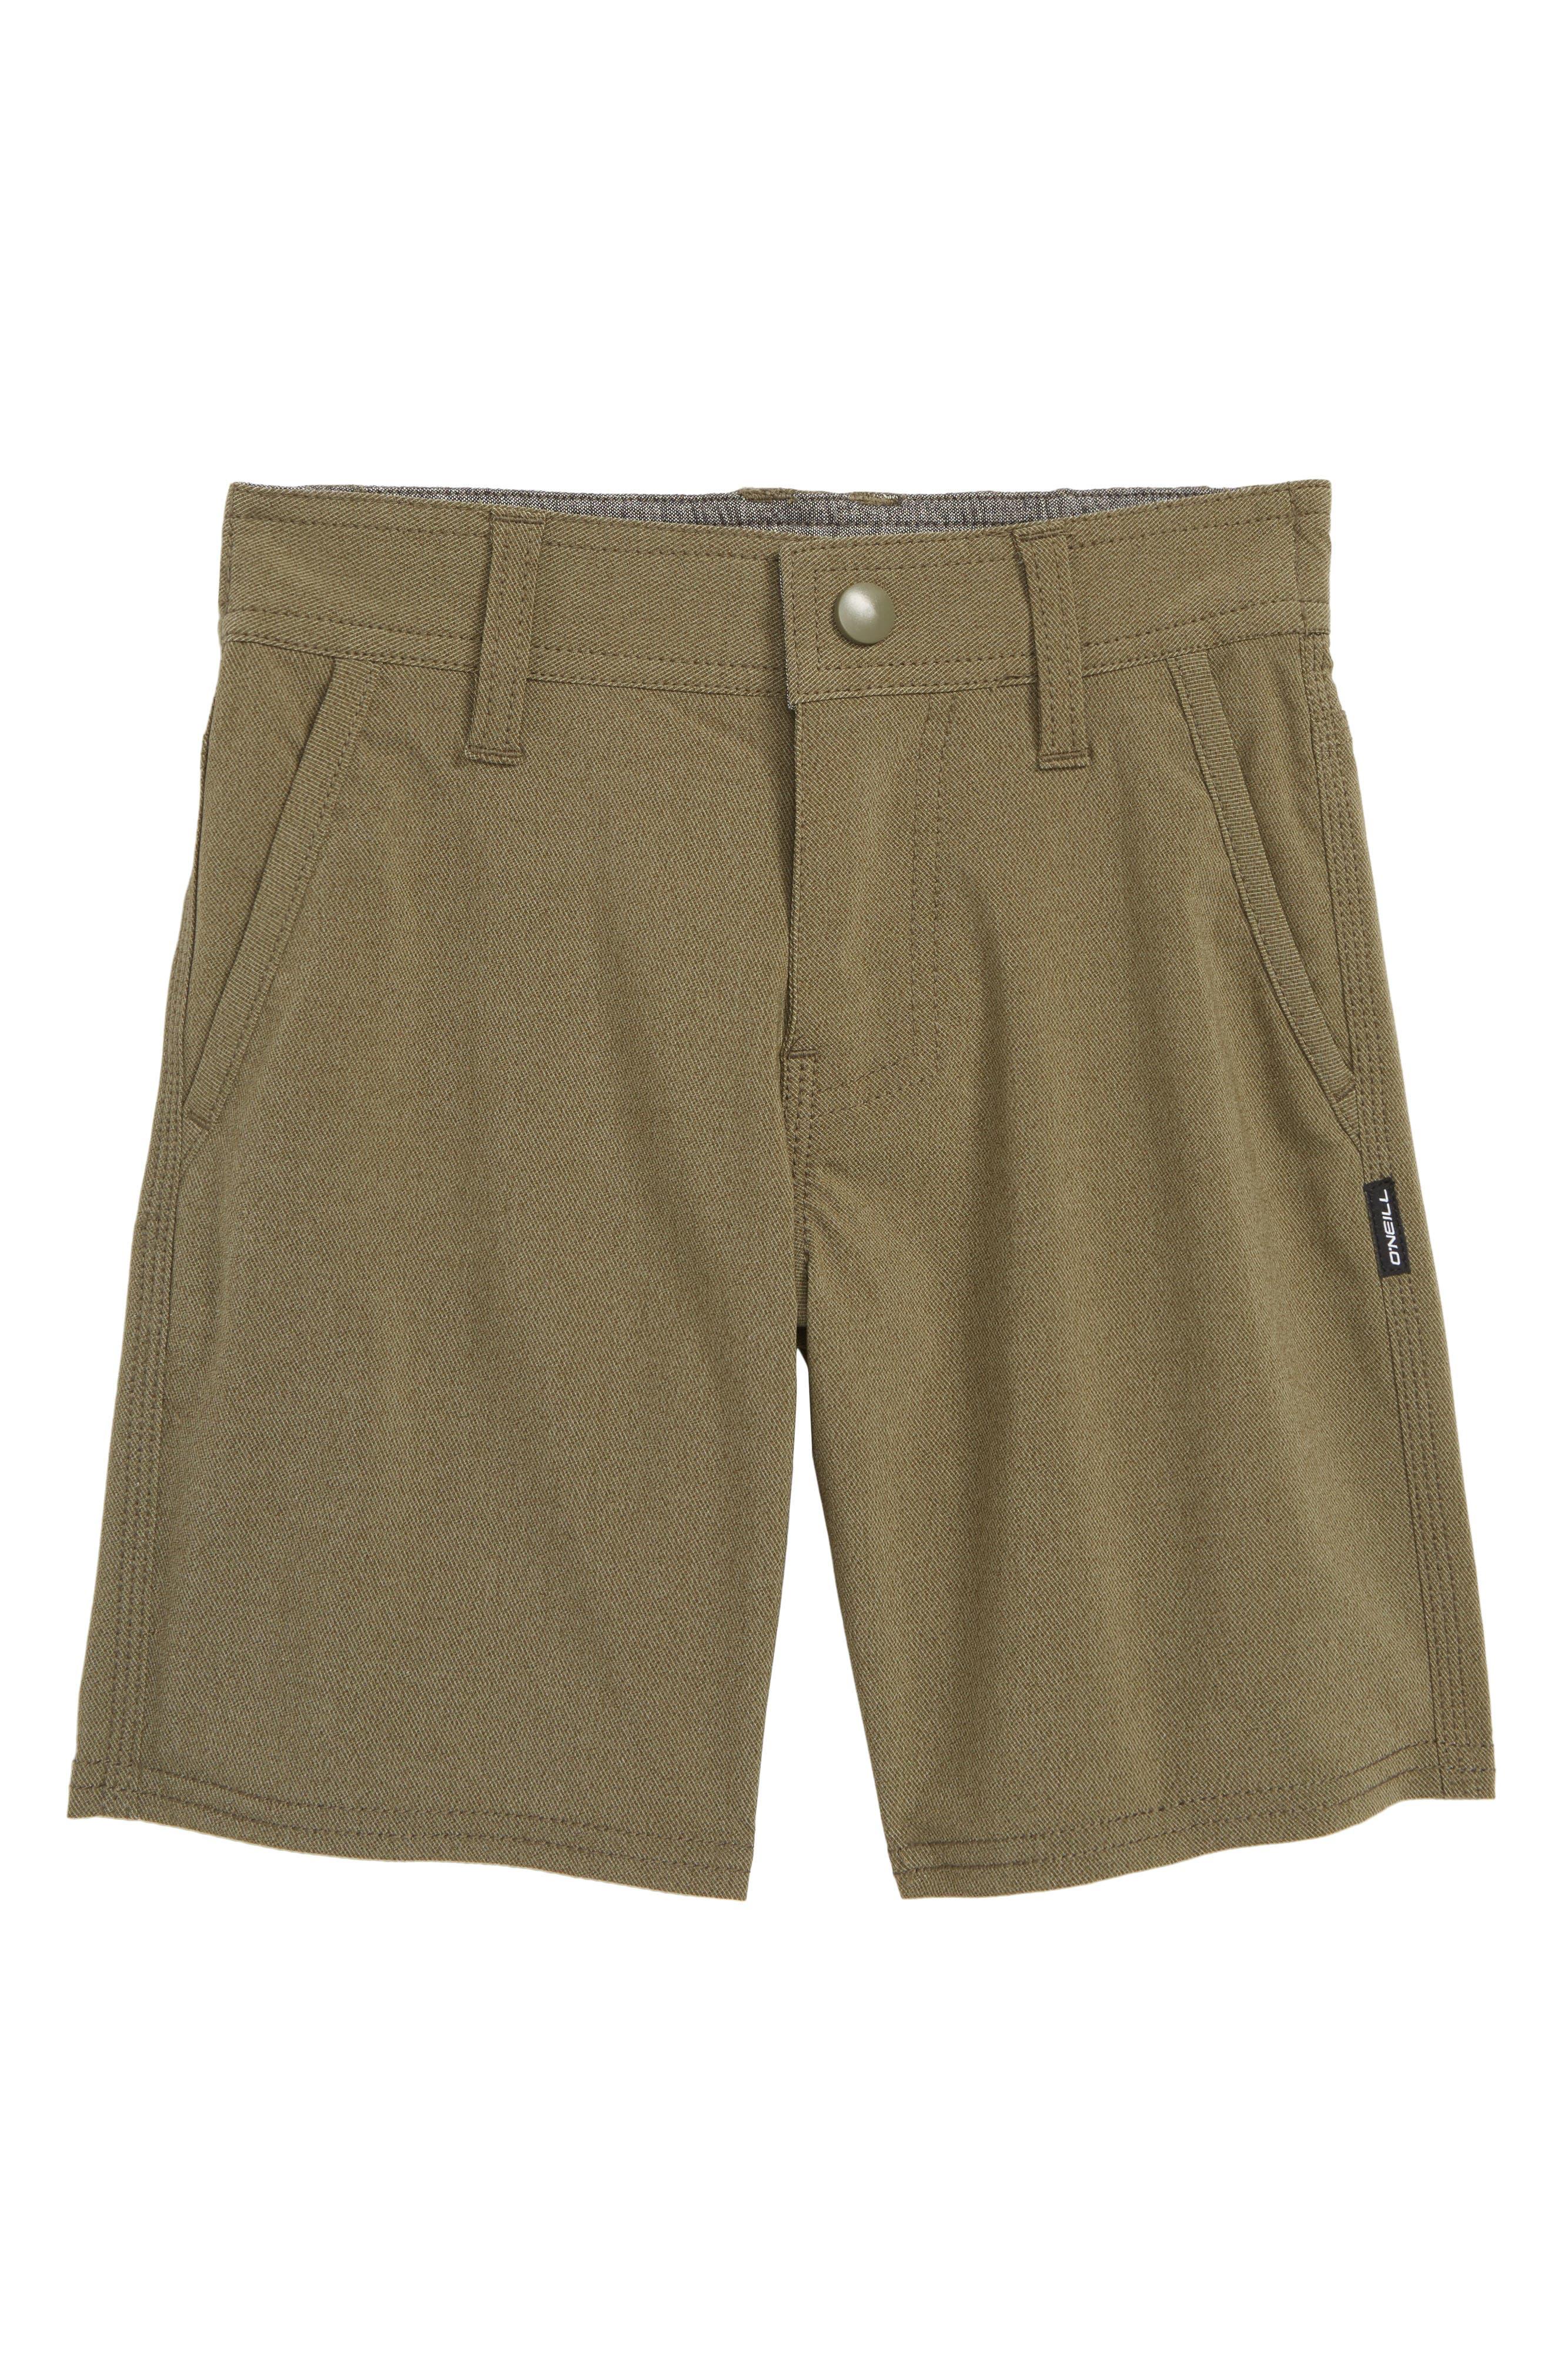 Stockton Hybrid Shorts,                         Main,                         color, MILITARY GREEN